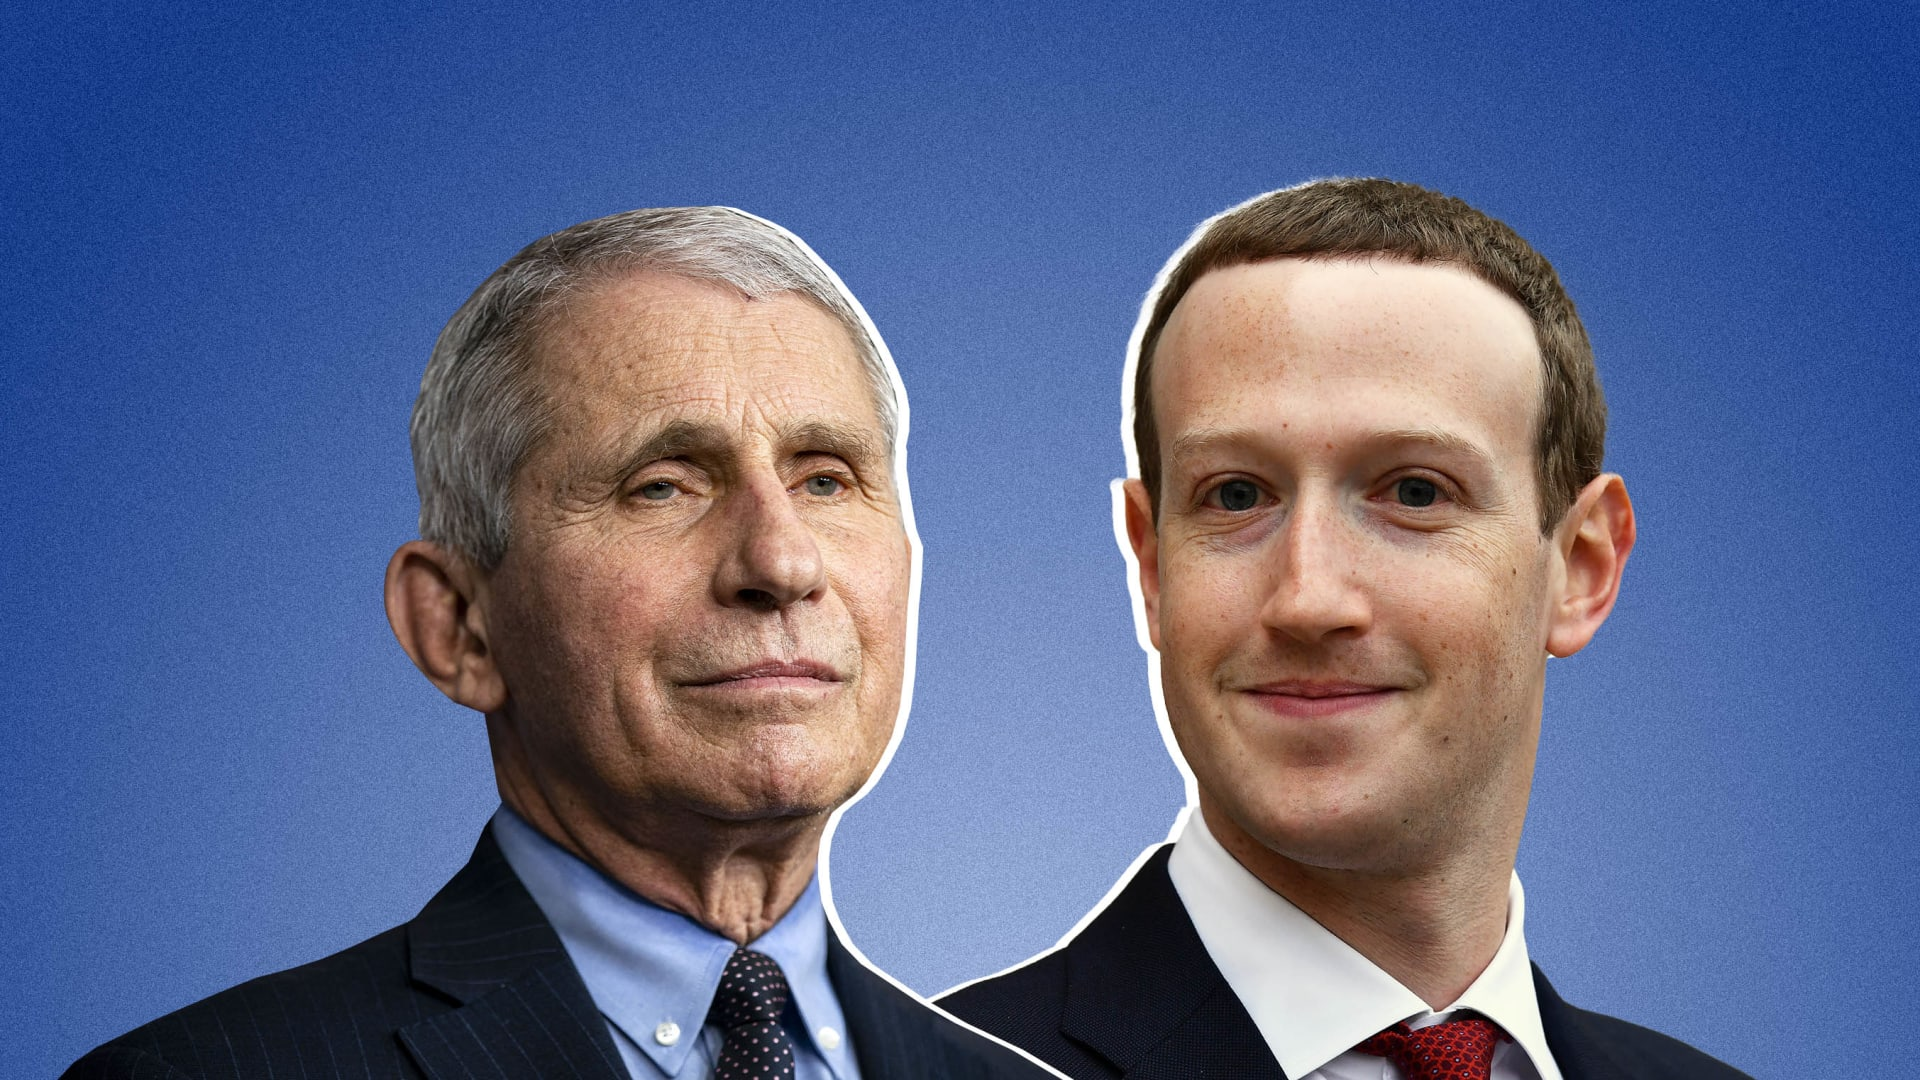 Anthony Fauci and Mark Zuckerberg.